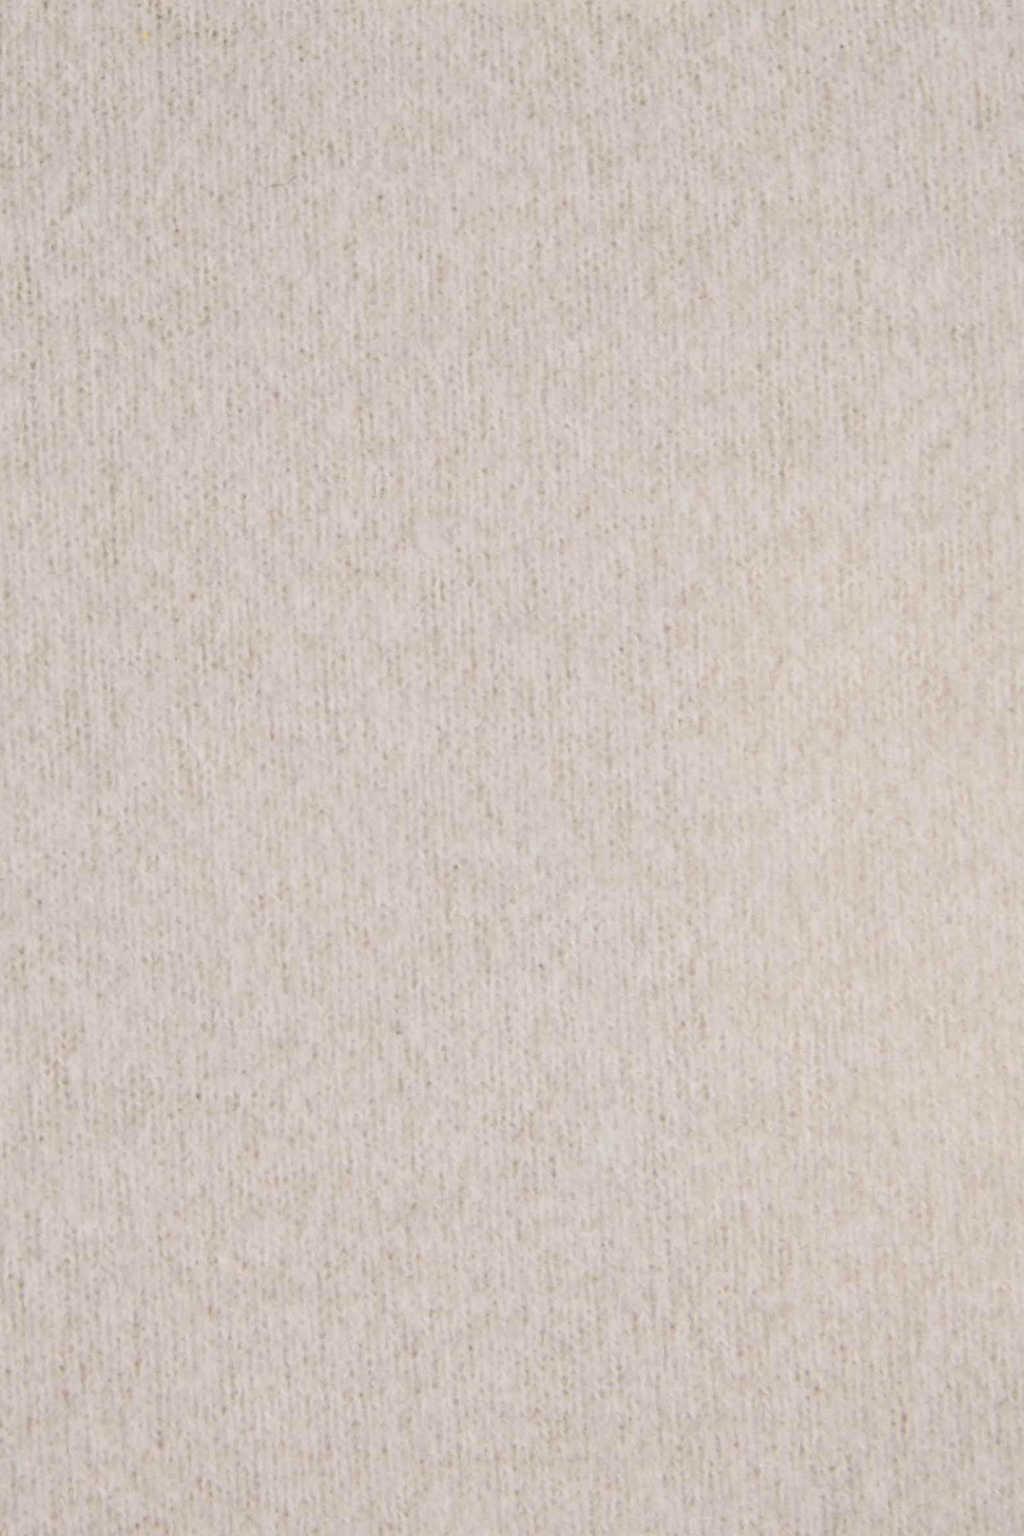 Sweater 1641 Oatmeal 6